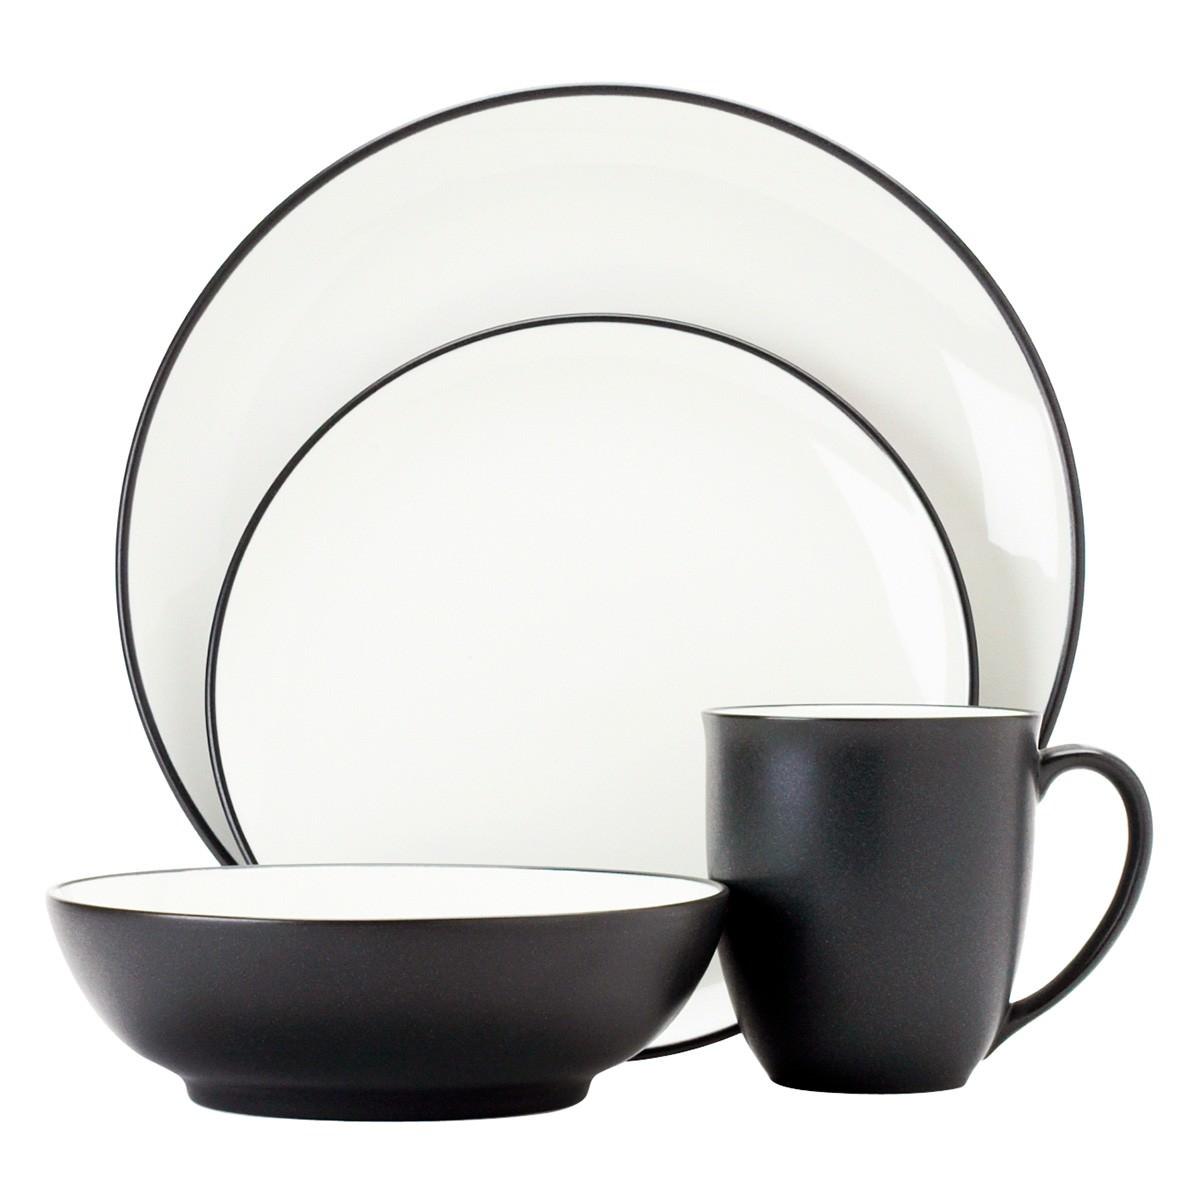 Noritake Colorwave Graphite 16 Piece Stoneware Dinner Set